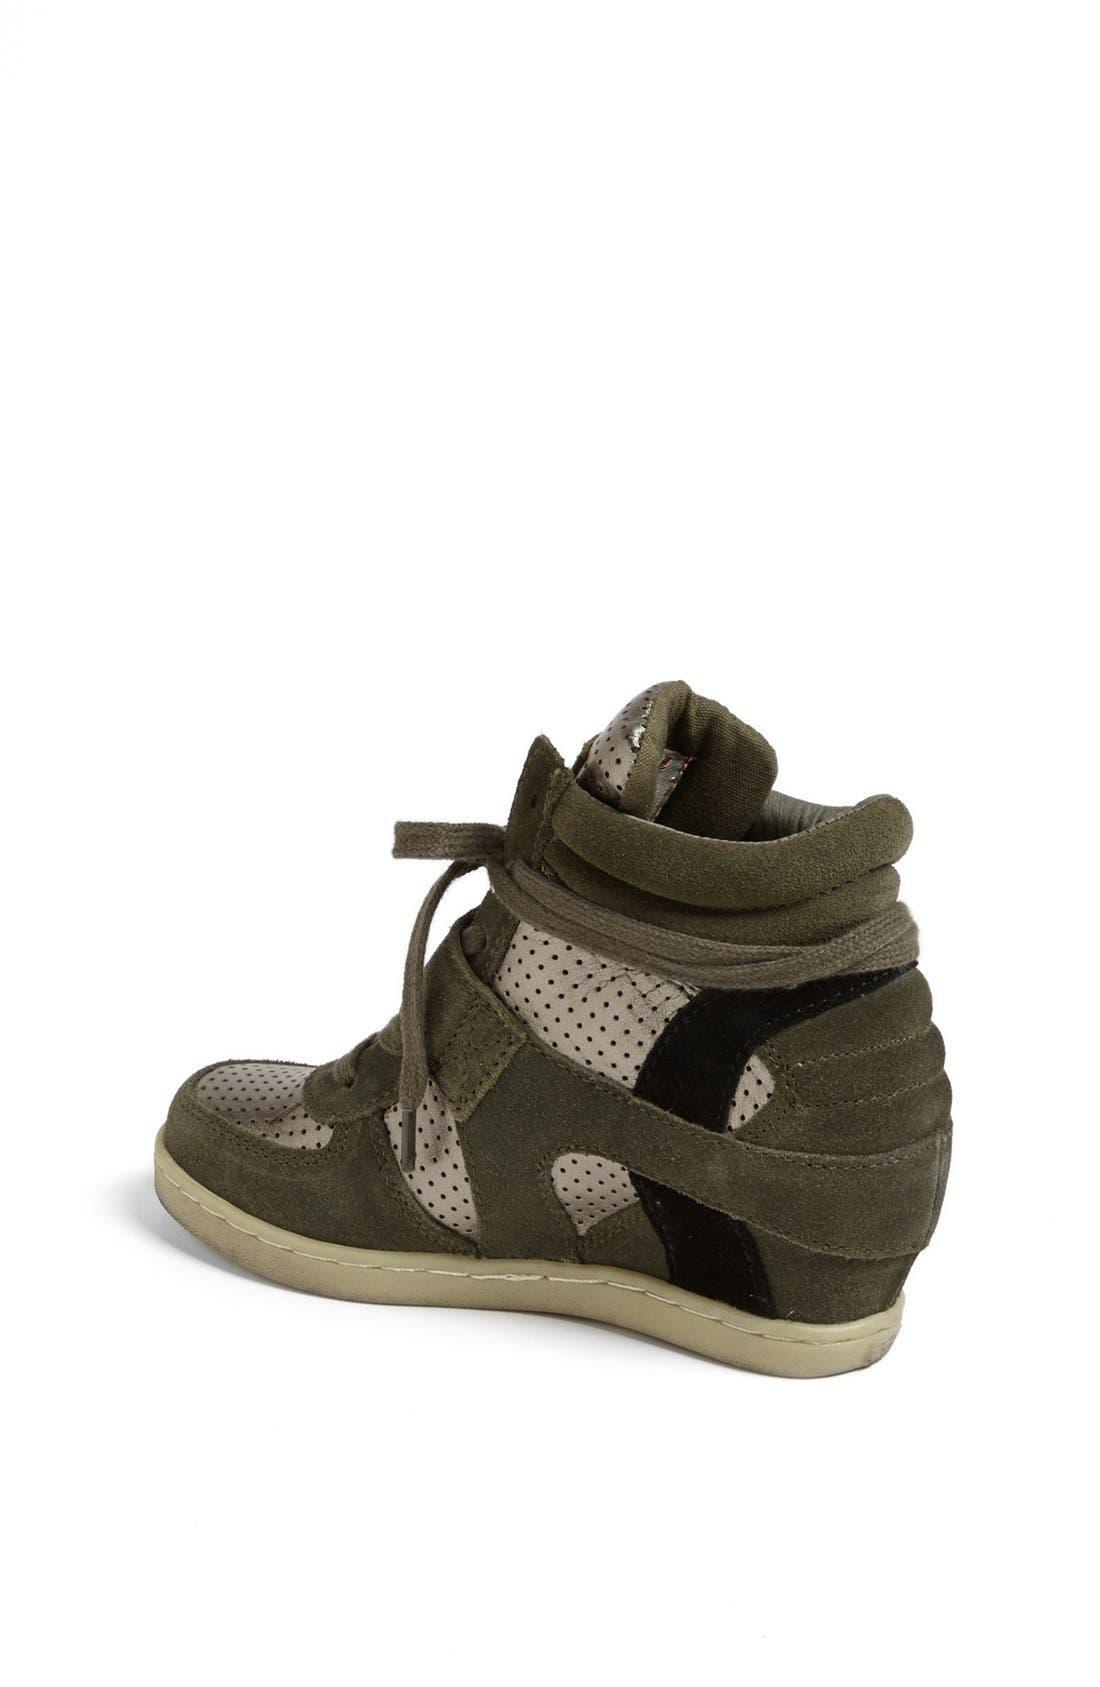 Alternate Image 2  - Ash 'Babe' Hidden Wedge Sneaker (Toddler, Little Kid & Big Kid)